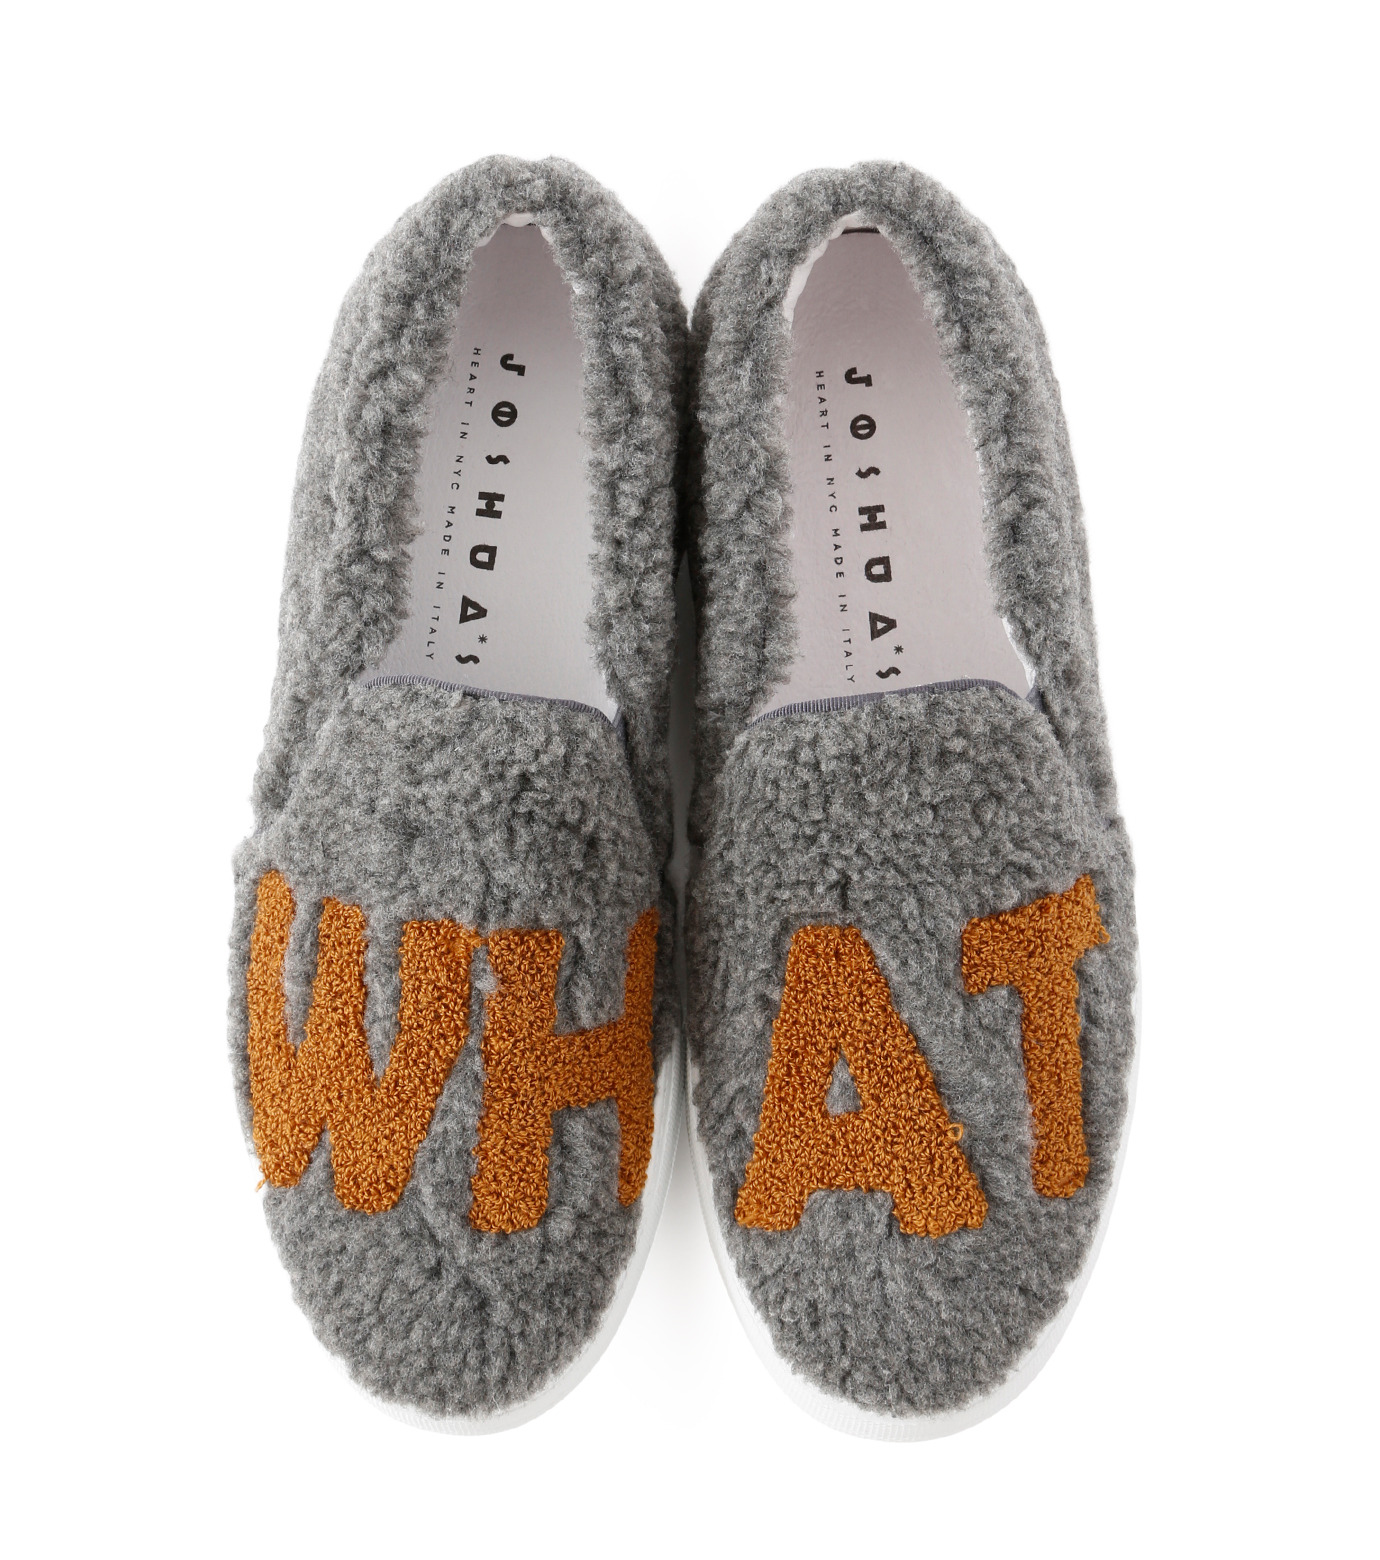 Joshua SANDERS(ジョシュア・サンダース)のSlip On Grey What-GRAY(スニーカー/sneaker)-10078S-11 拡大詳細画像4